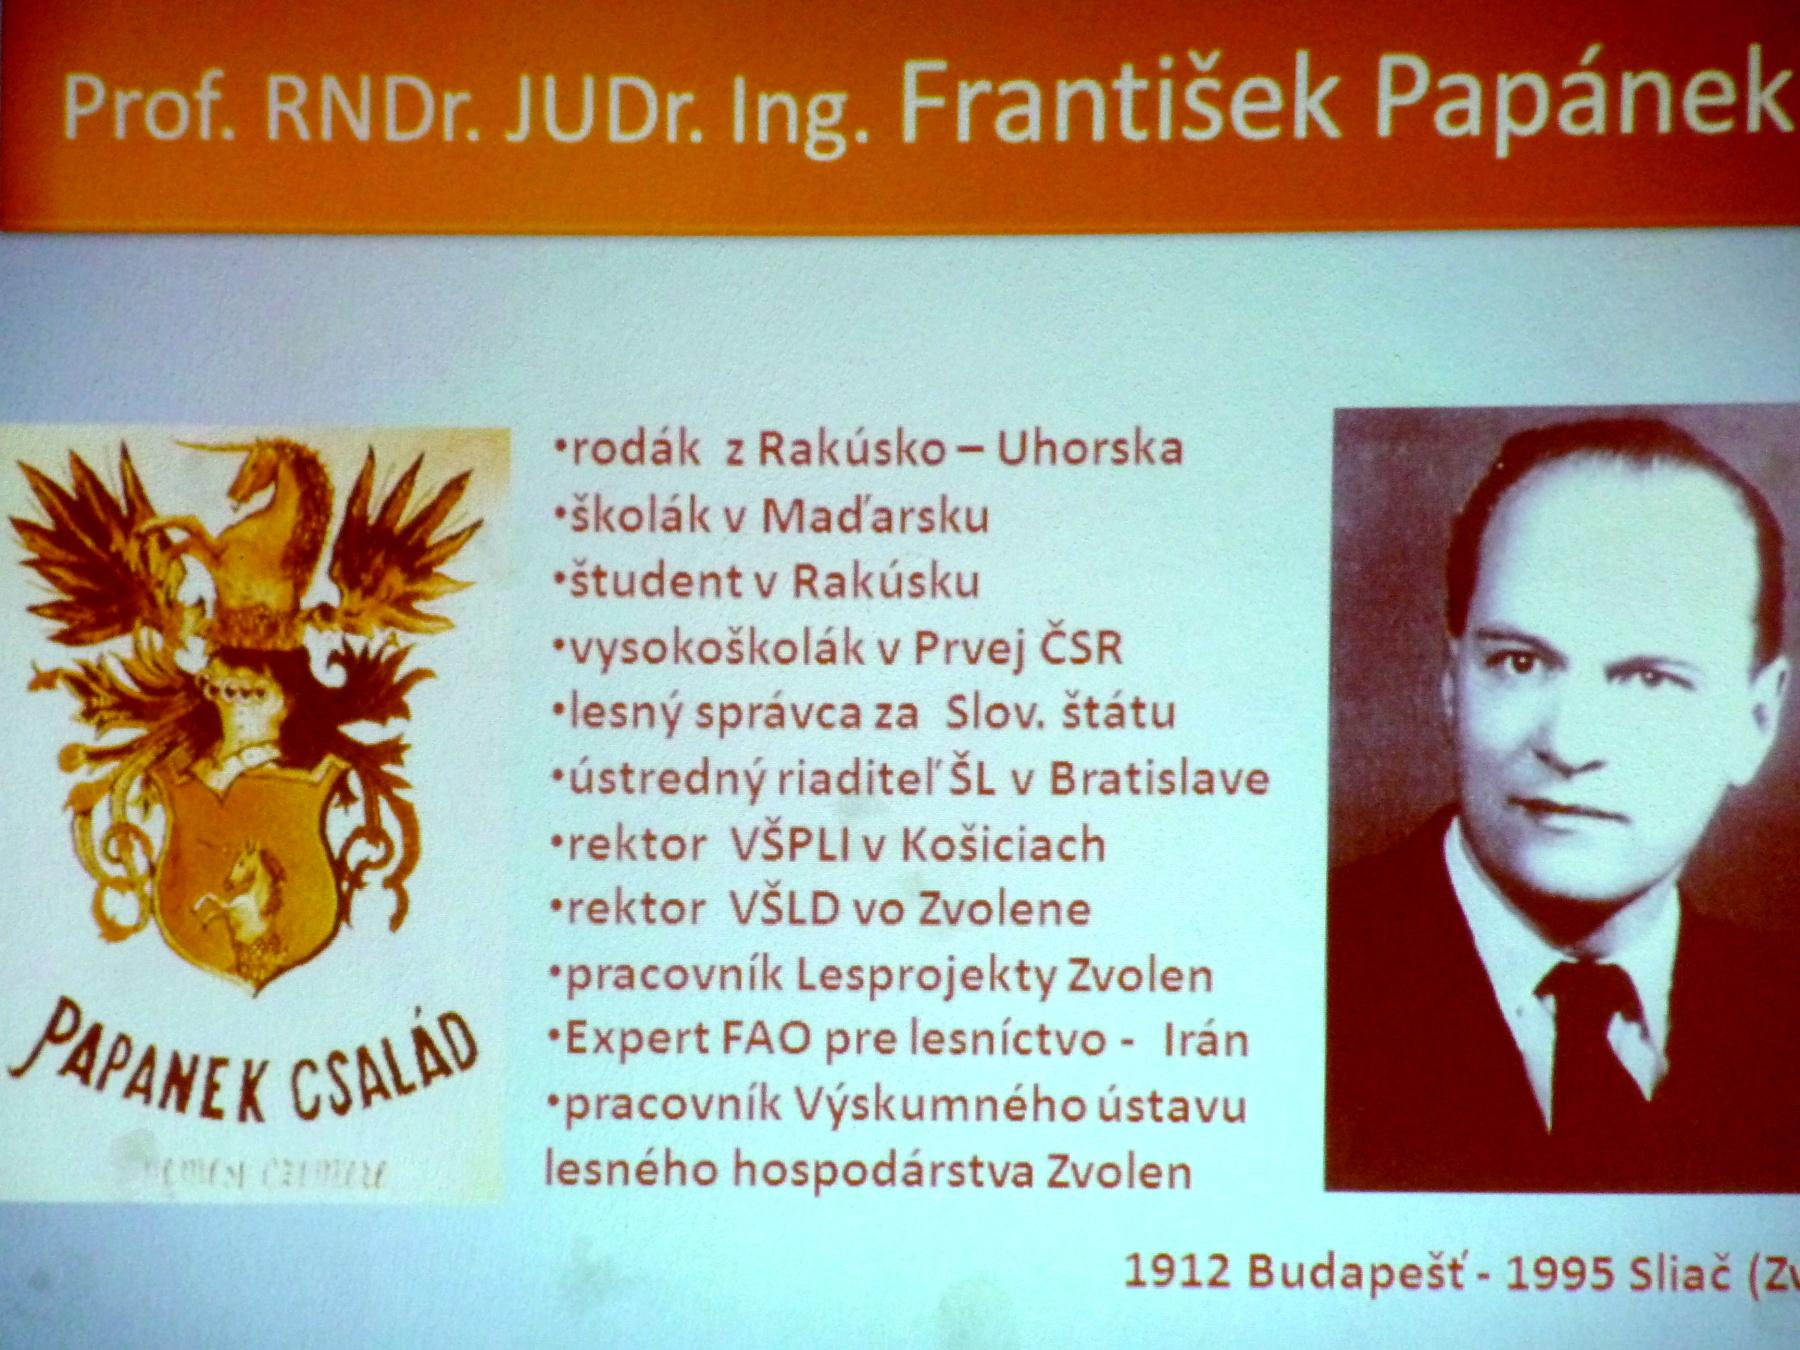 frantisek-papanek-2